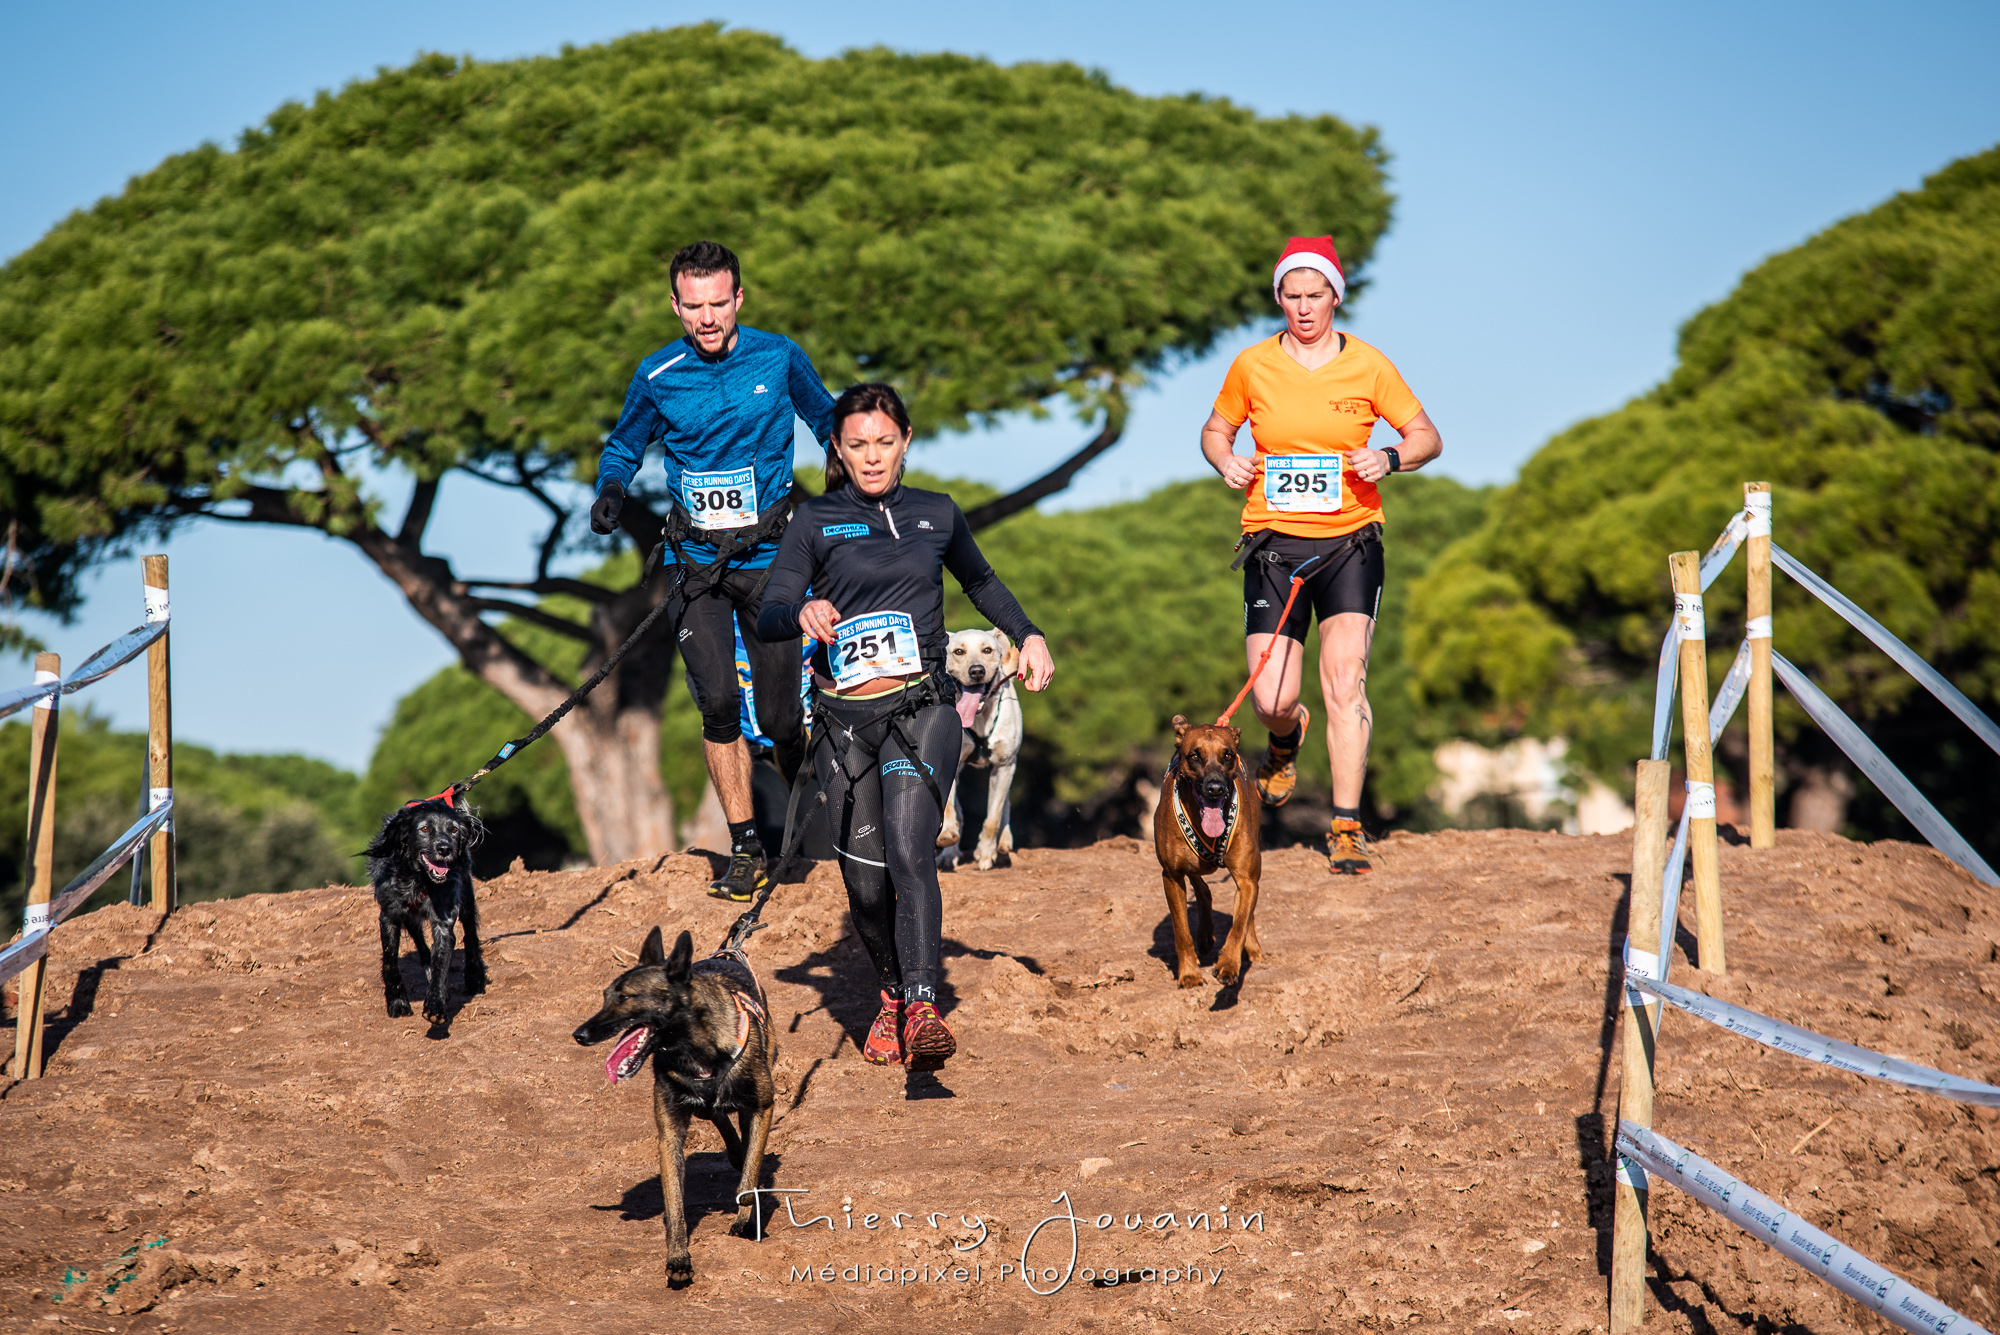 Calendrier Canicross.Canicross Des Hyeres Running Days 15 Decembre 2019 A